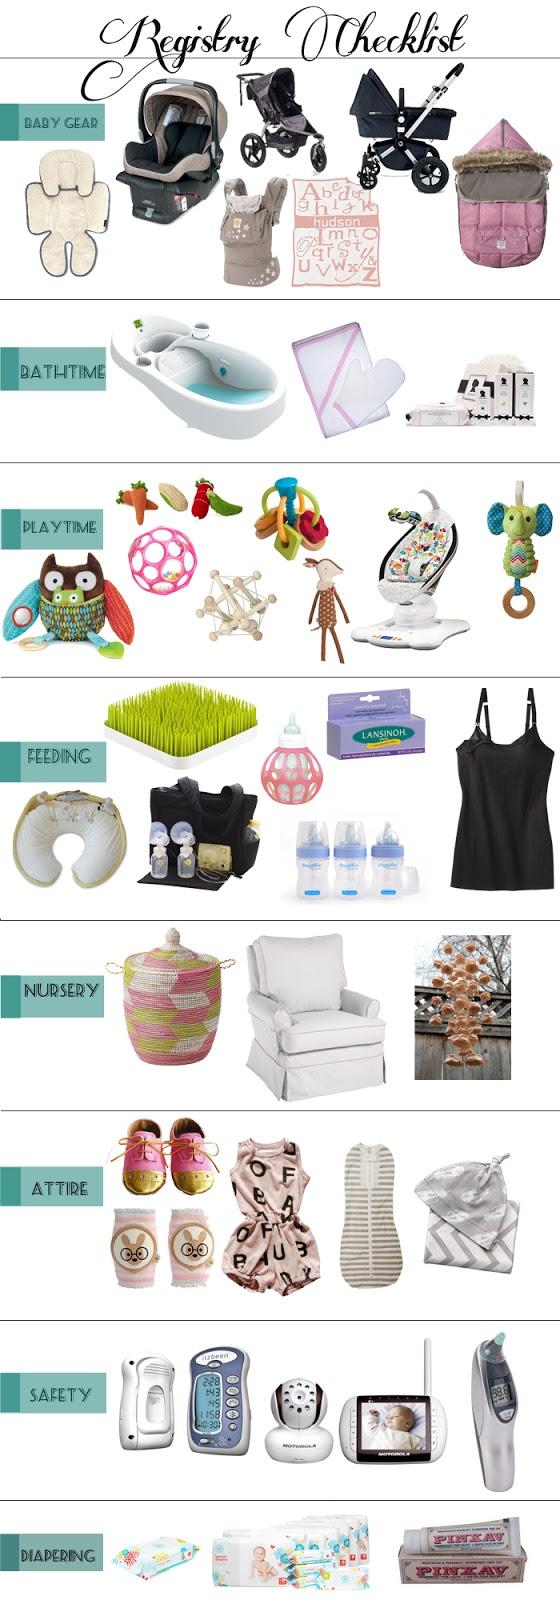 Baby Registry Checklist - Lynzy & Co.